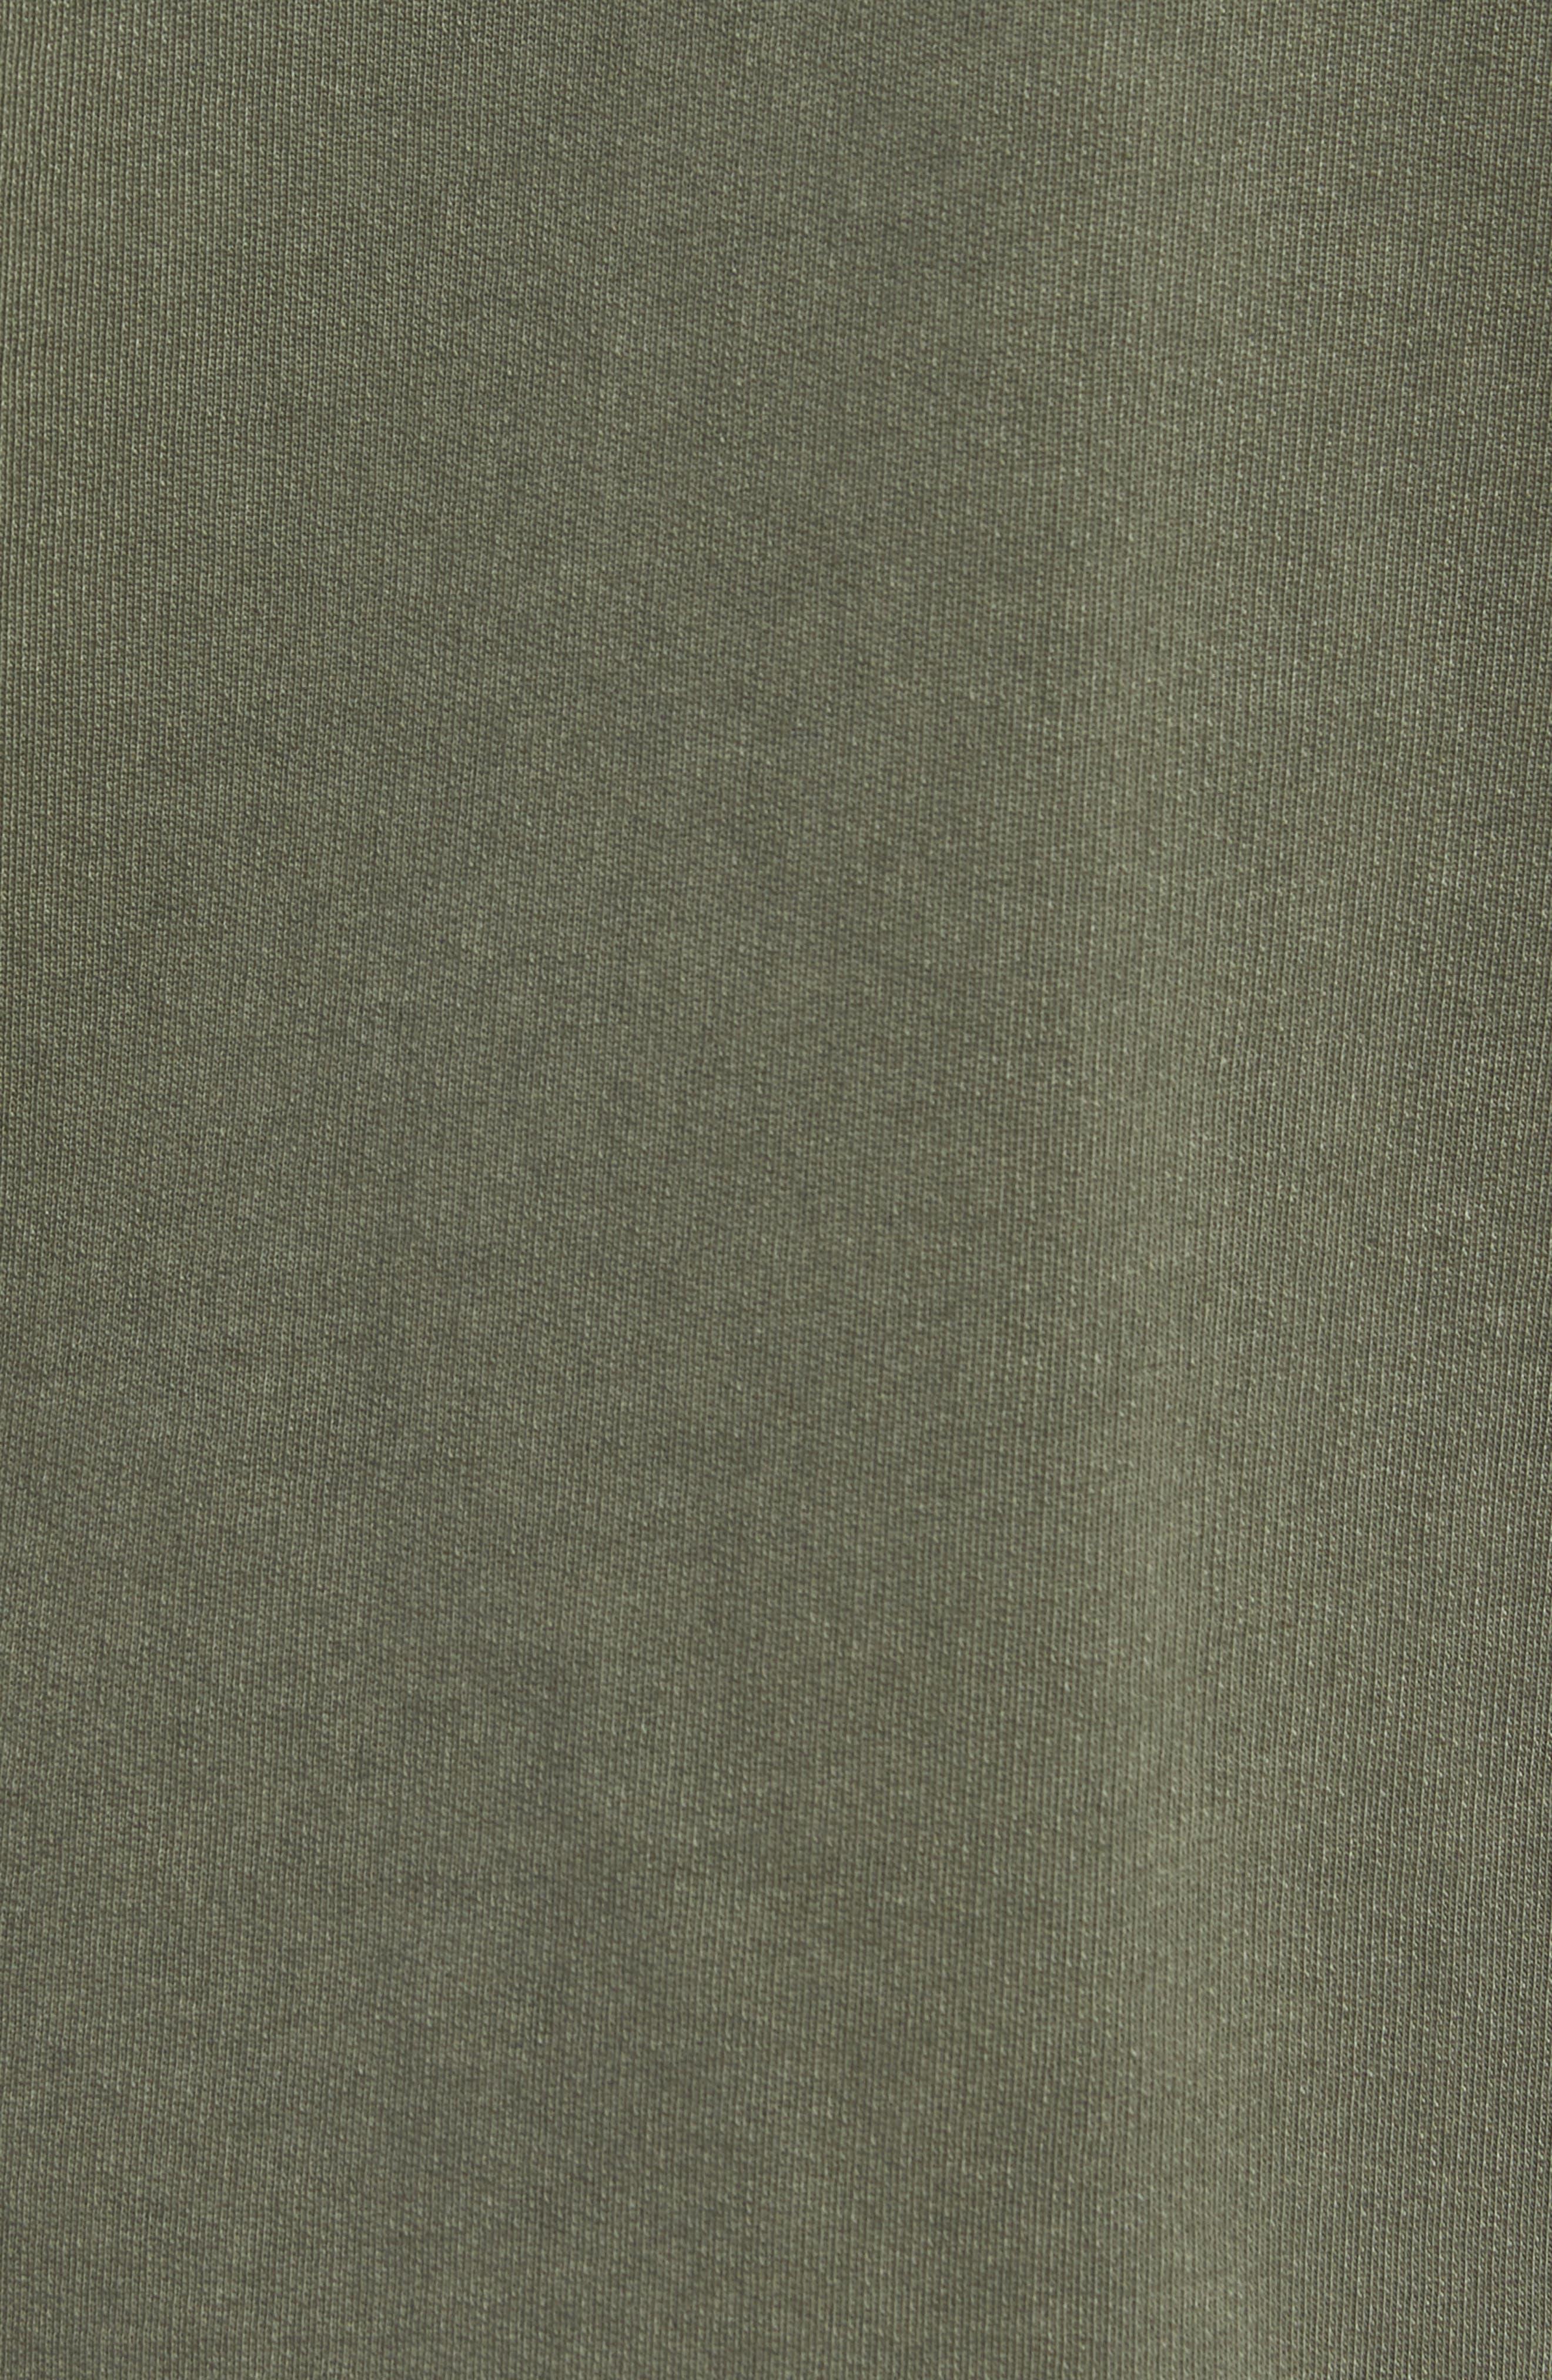 Patchwork Long Sleeve T-Shirt,                             Alternate thumbnail 5, color,                             300